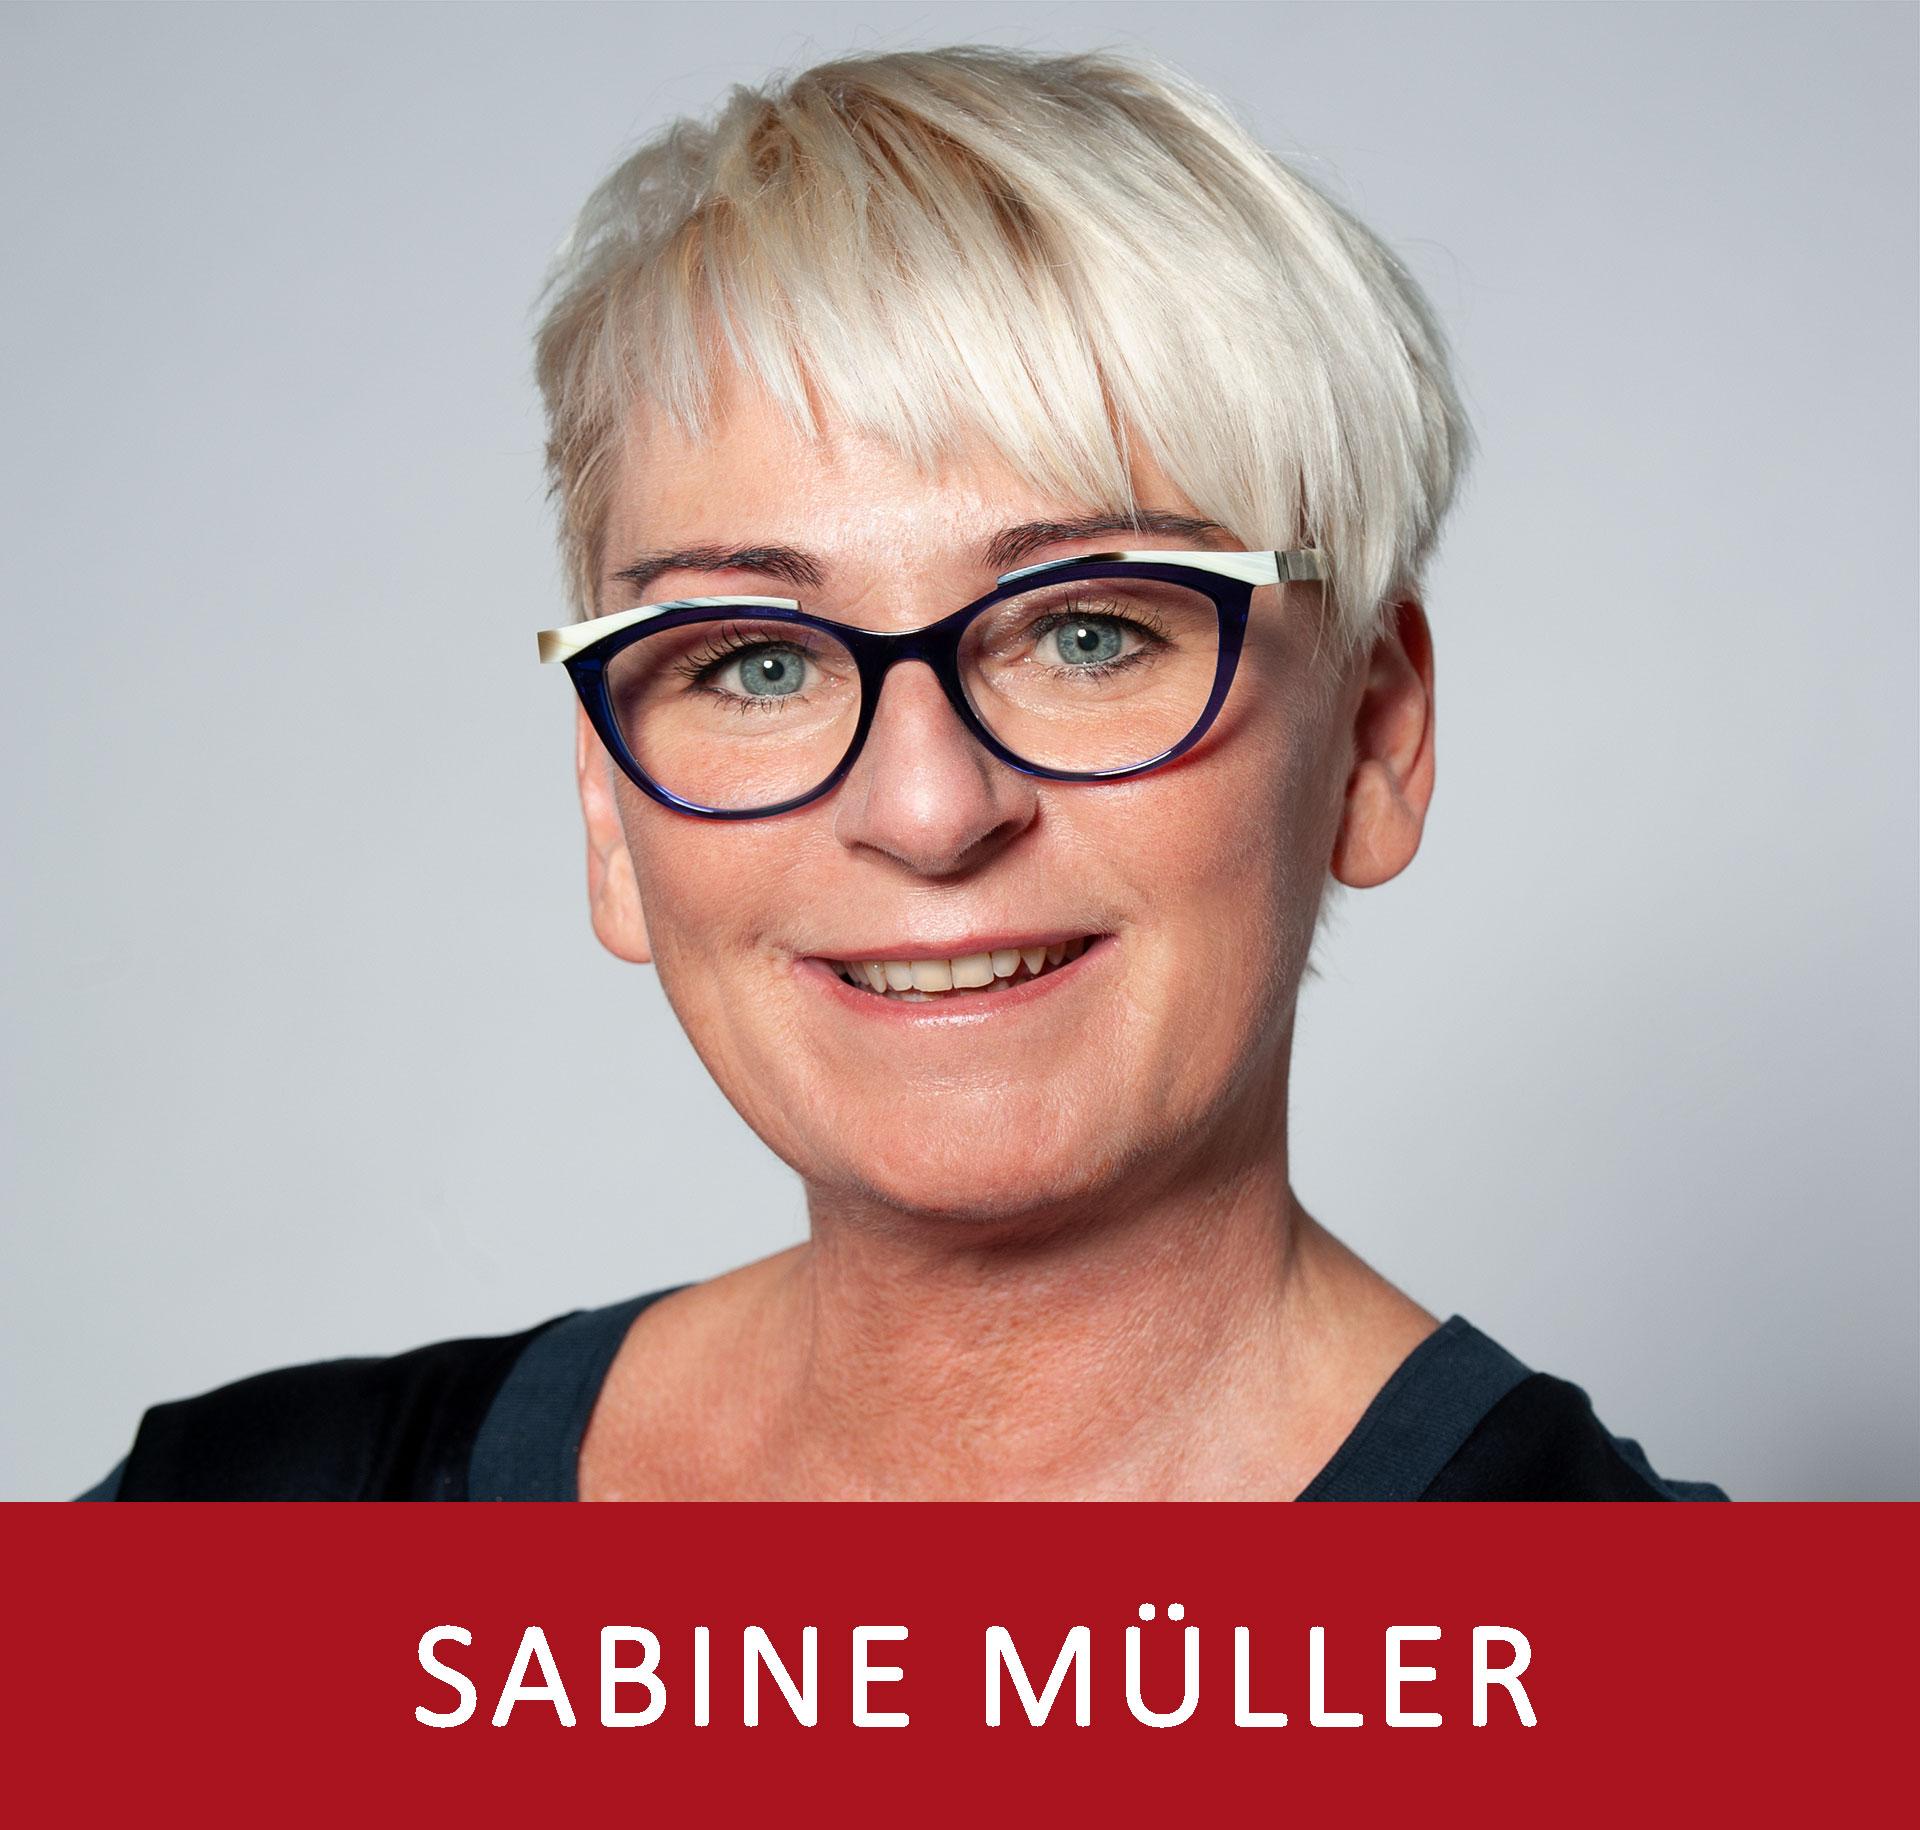 Sabine-Müller